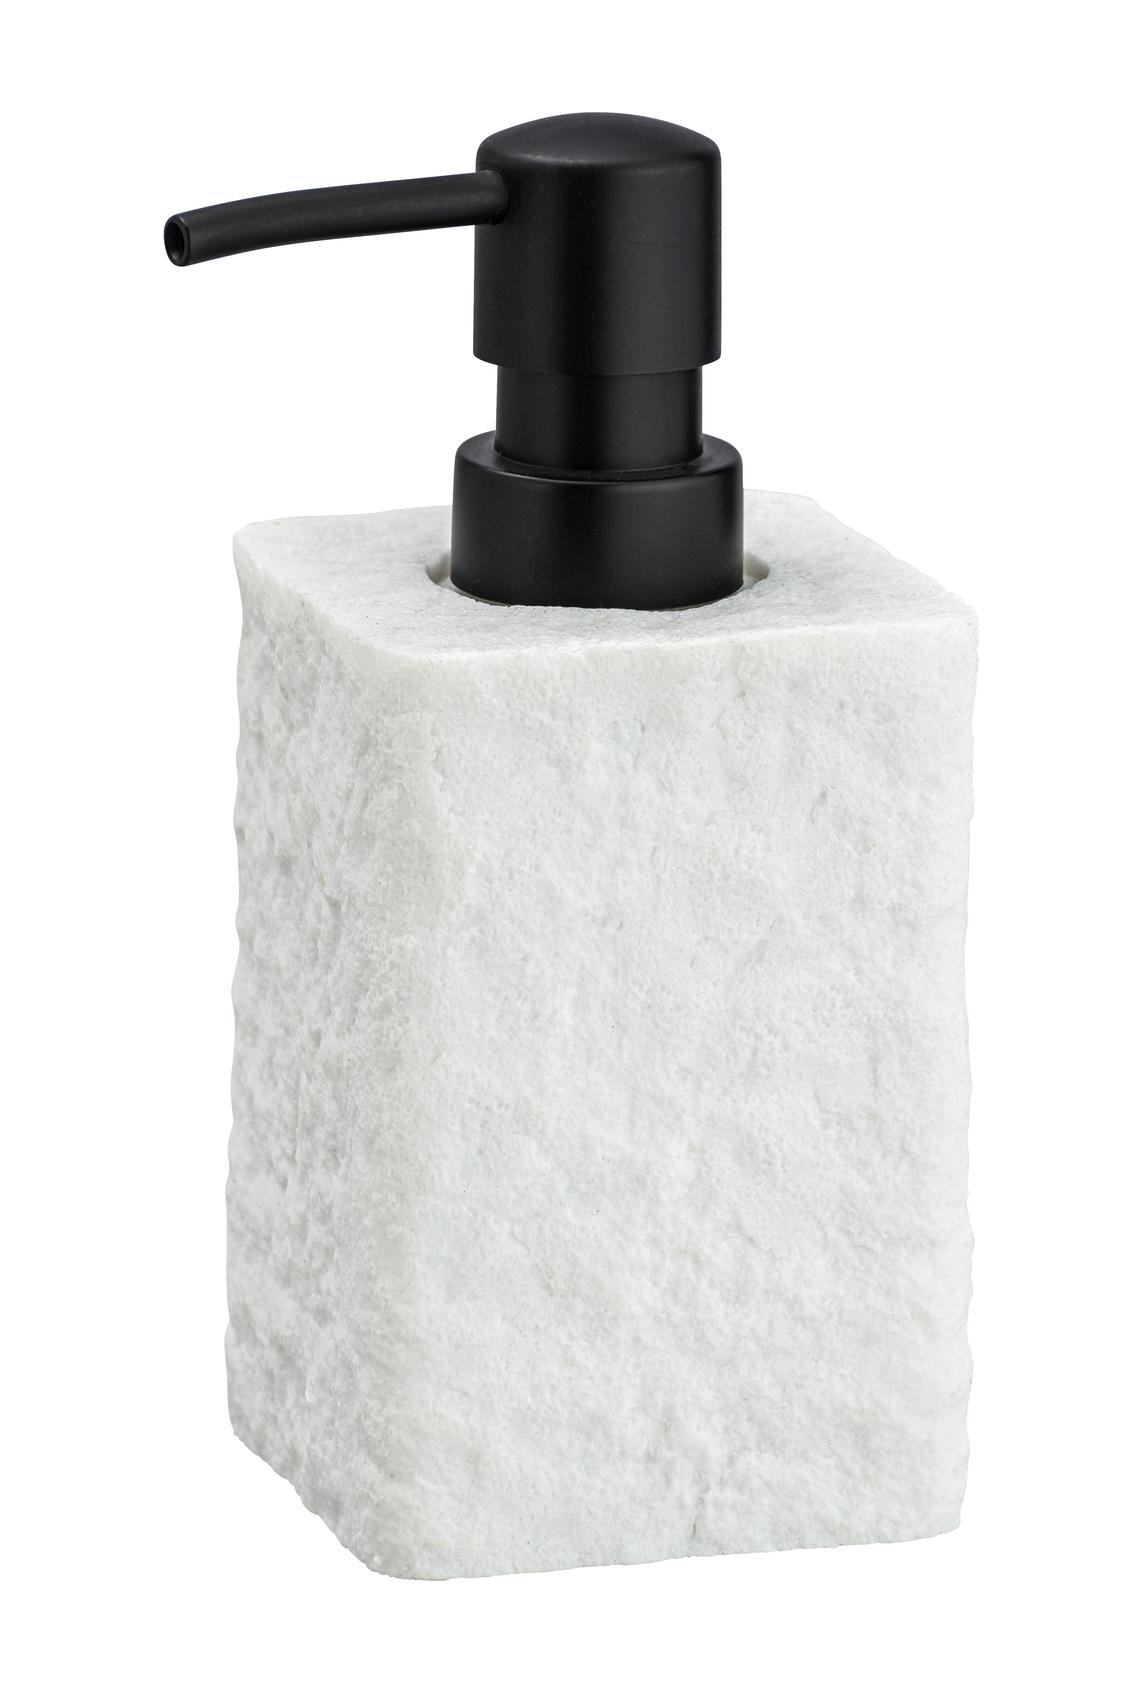 Dozator pentru sapun, din polirasina, Villata Alb, L7xl7xH15 cm imagine